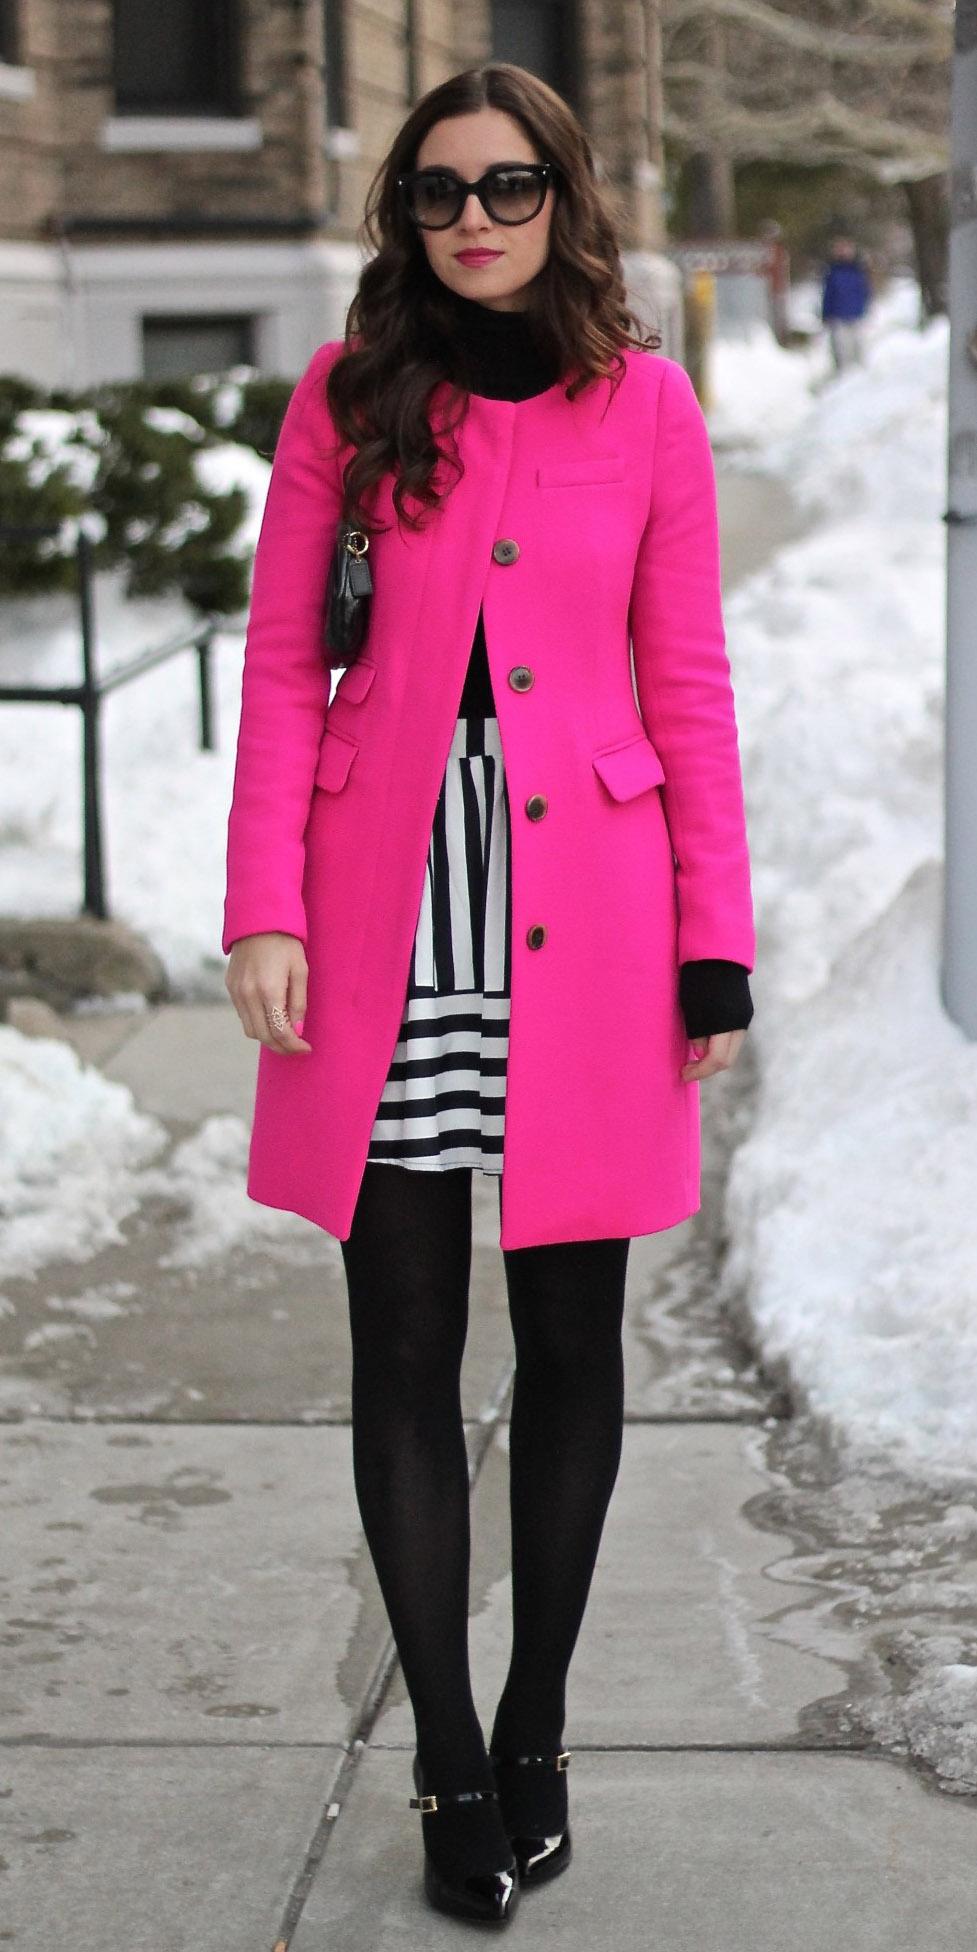 white-mini-skirt-stripe-black-sweater-turtleneck-black-tights-black-shoe-pumps-sun-pink-magenta-jacket-coat-fall-winter-brun-dinner.jpg